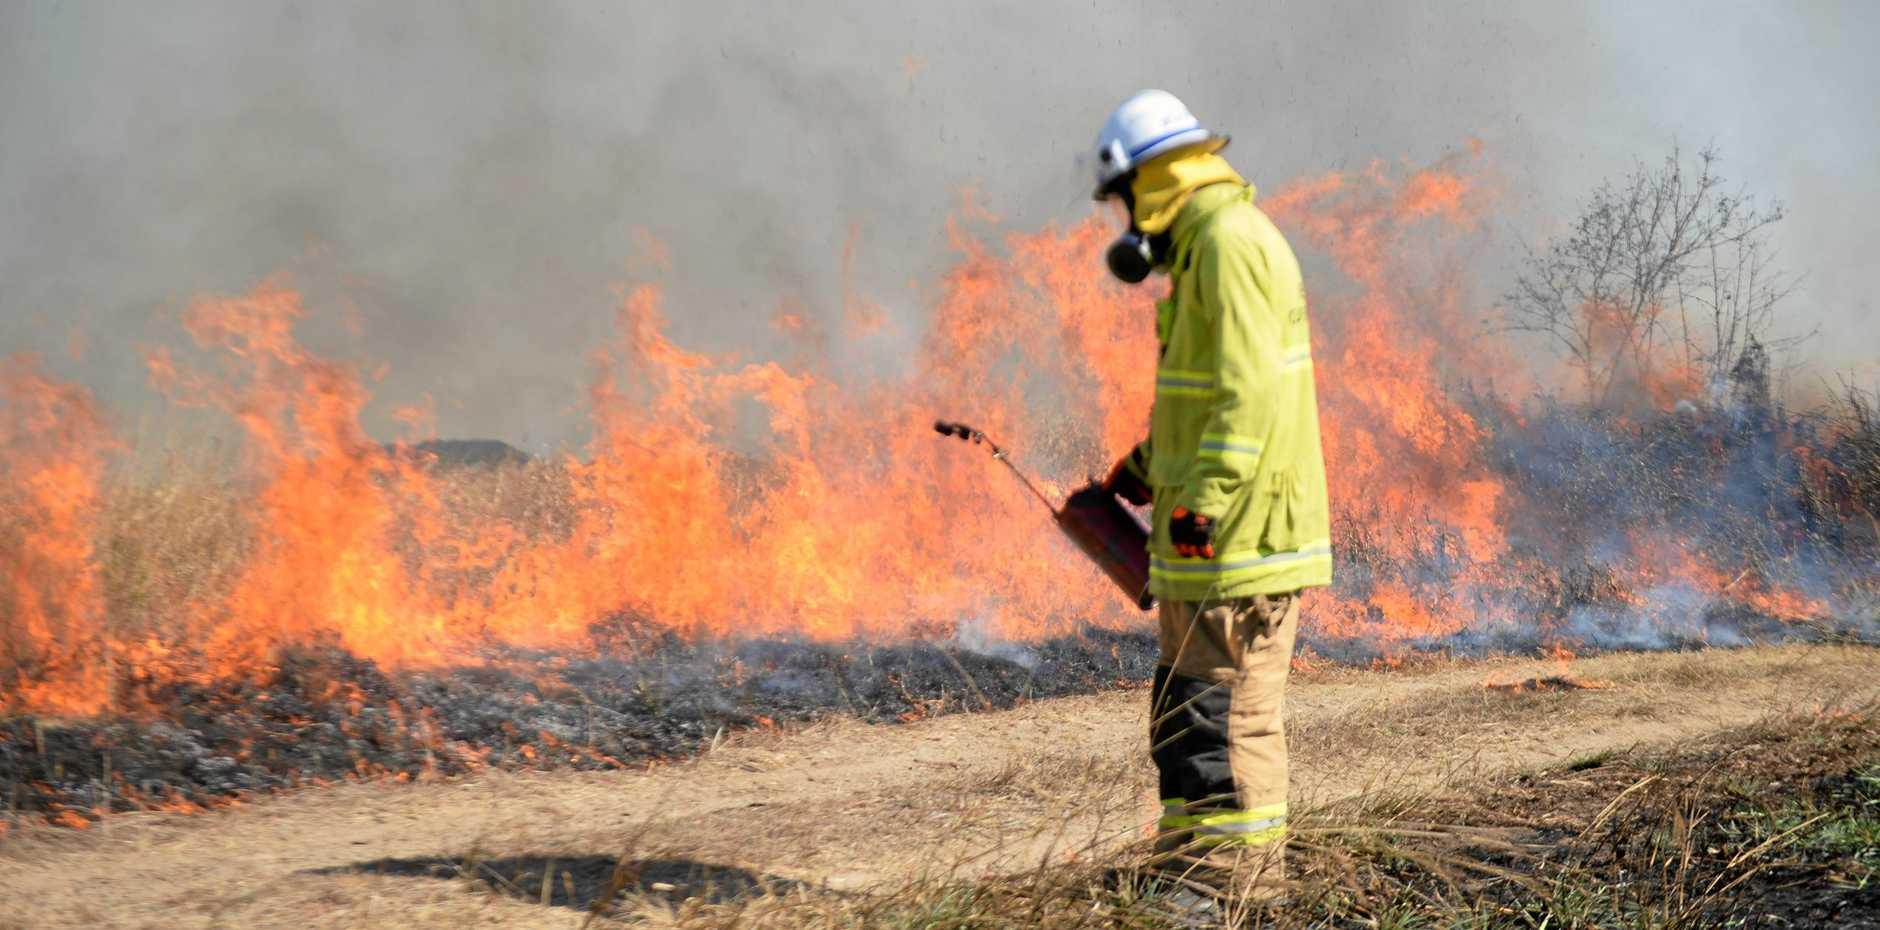 Crews across the Mackay region are fighting fires.